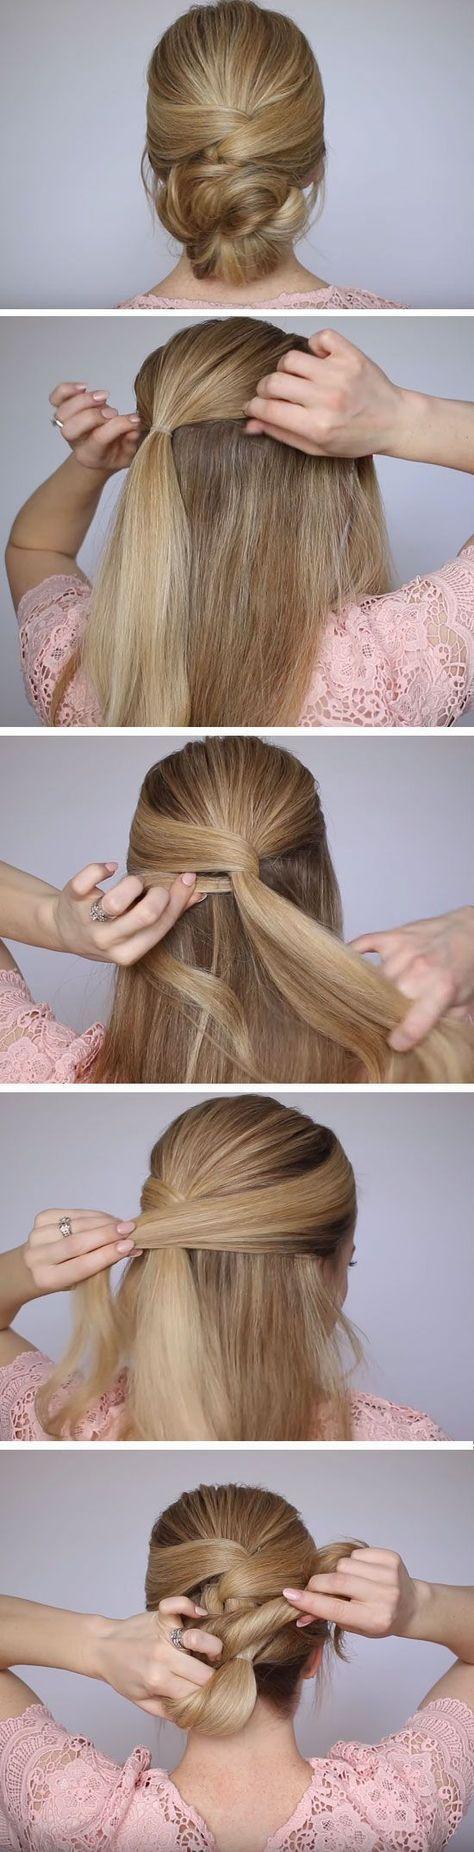 Pretty Low Bun | Quick DIY Prom Hairstyles for Medium Hair ...